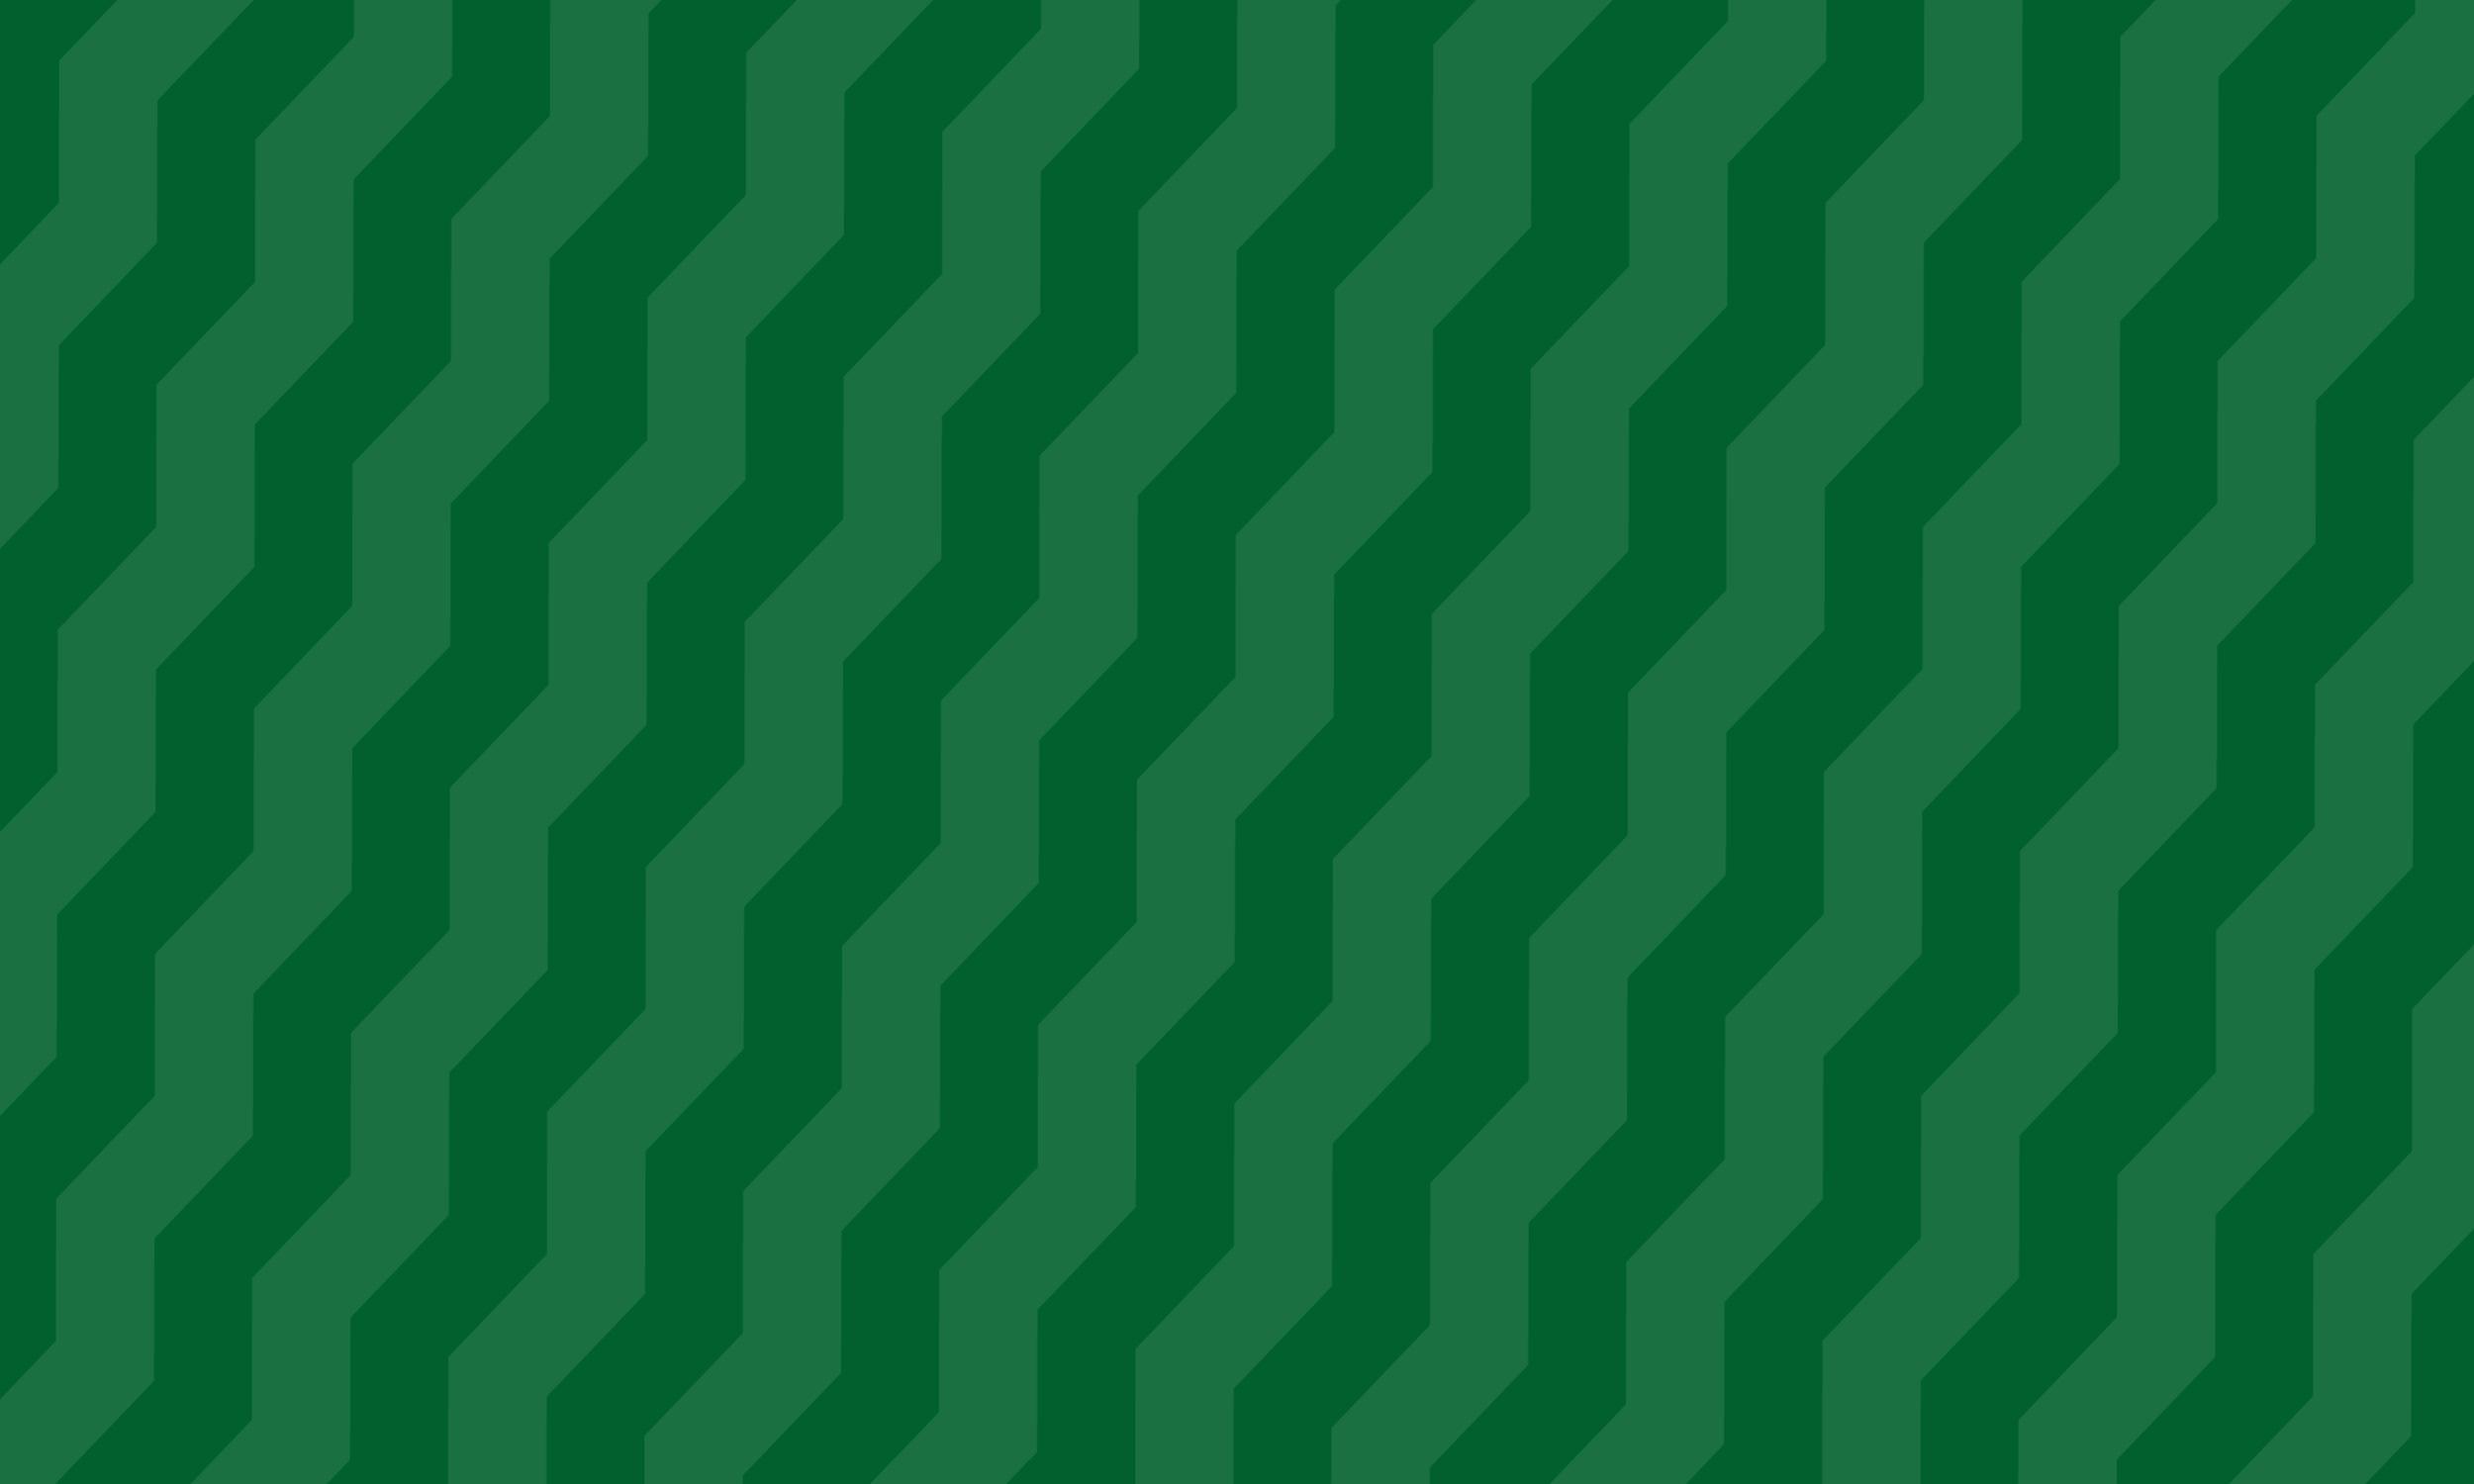 Forest zig zag pattern